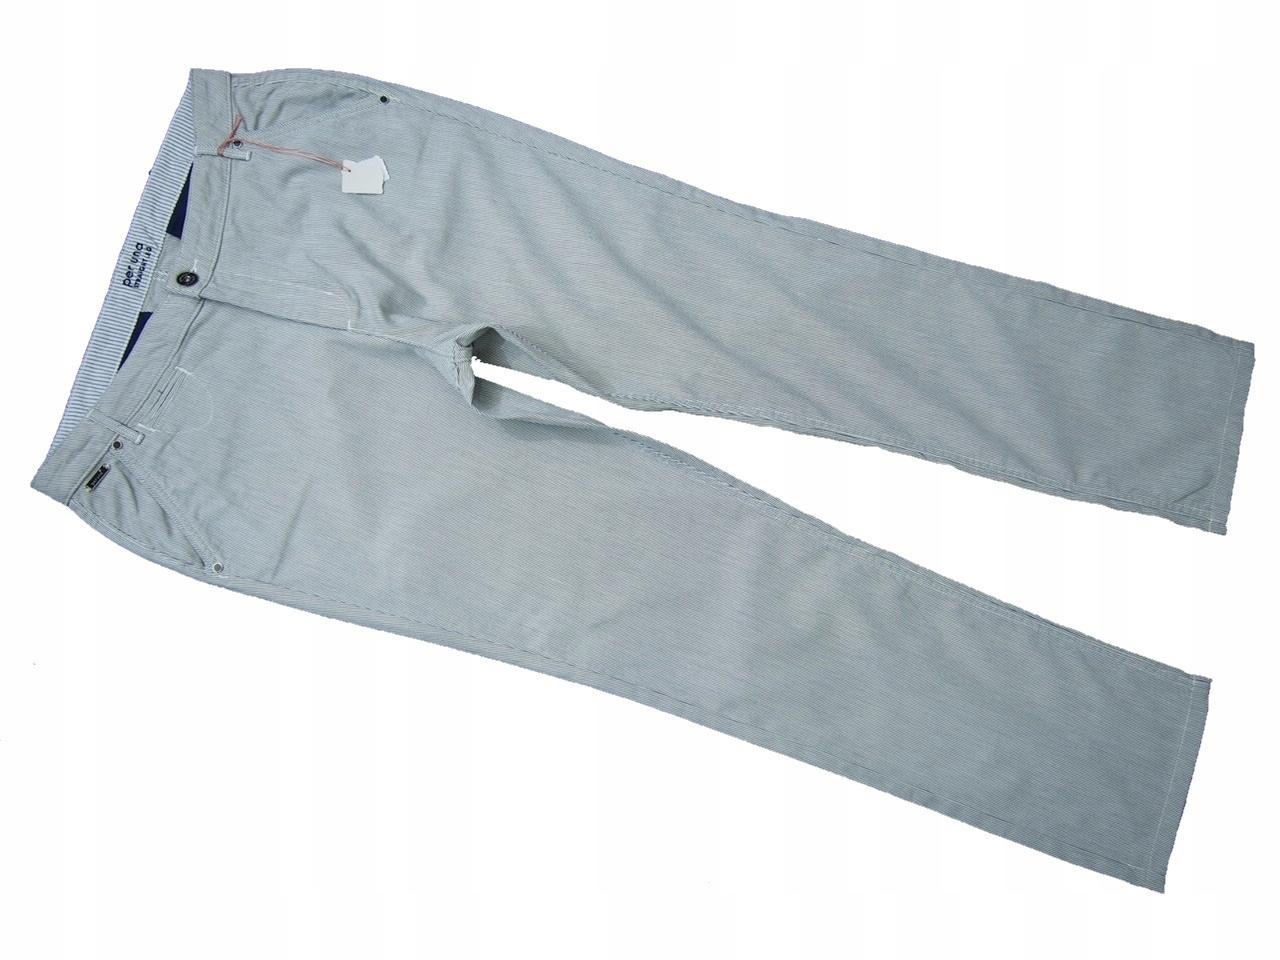 SPENCER eleganckie spodnie paski marine NOWE 44 46